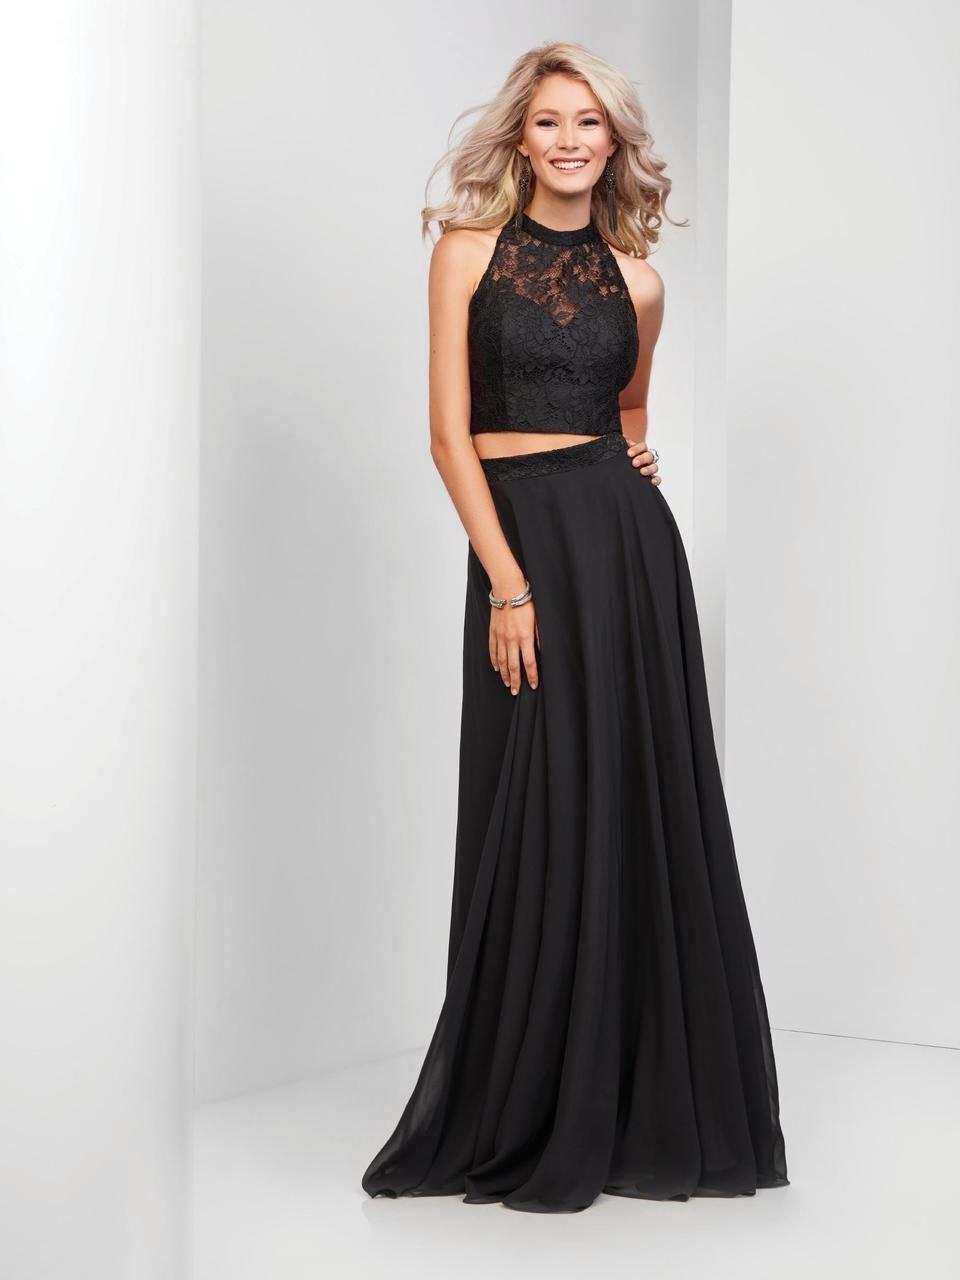 Clarisse - 3427 Two-Piece Lace Illusion A-Line Gown